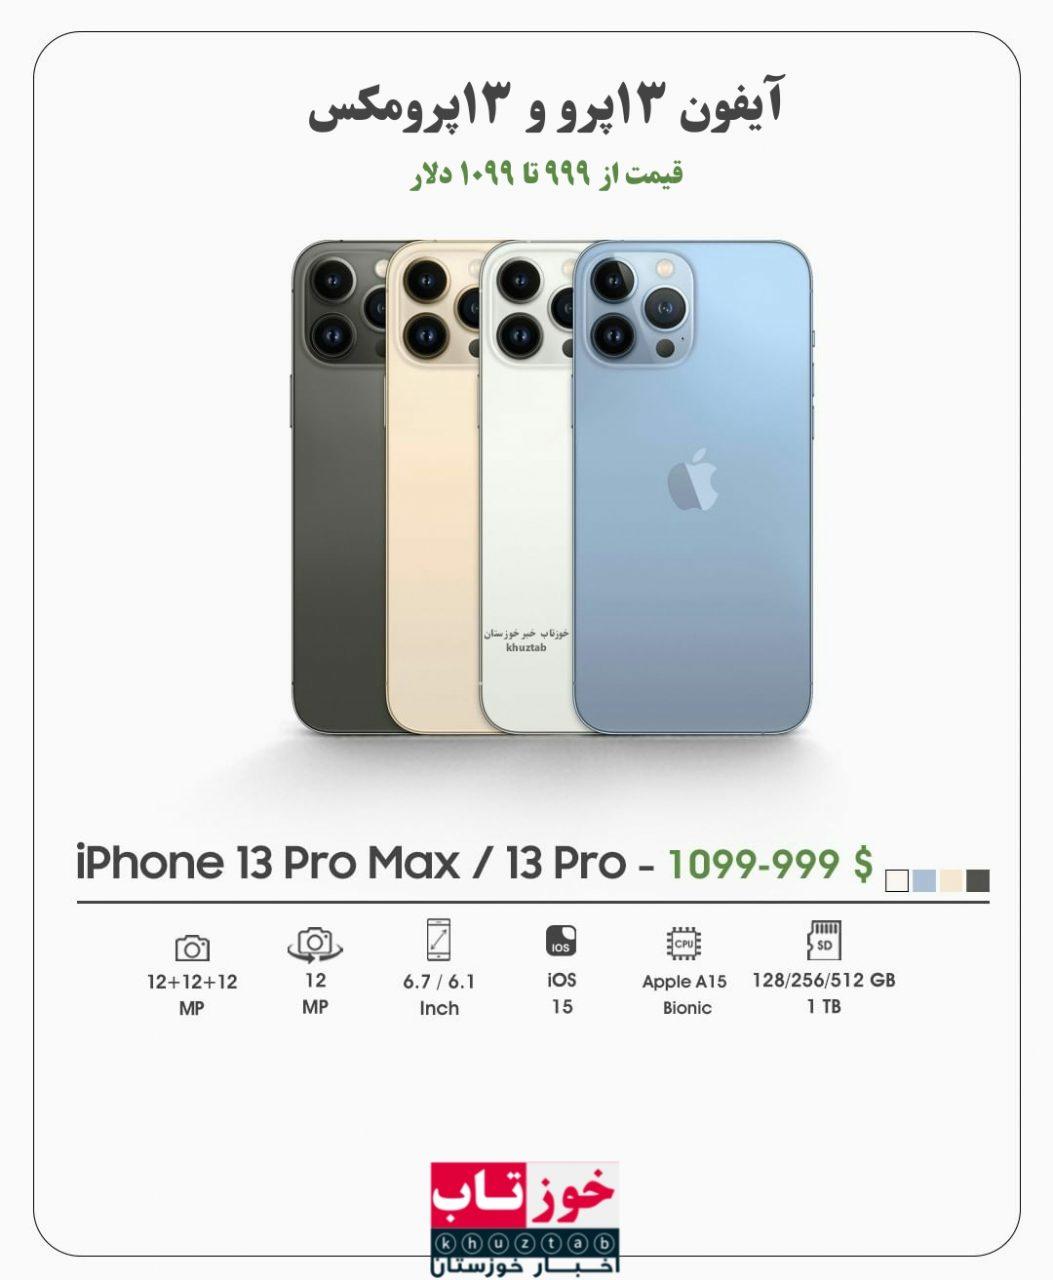 PicsArt 09 15 07.30.35 1053x1280 محصولات جدید اپل رونمایی شد/ از آیفون های سری ۱۳ تا آیپد مینی و اپلواچ سری ۷